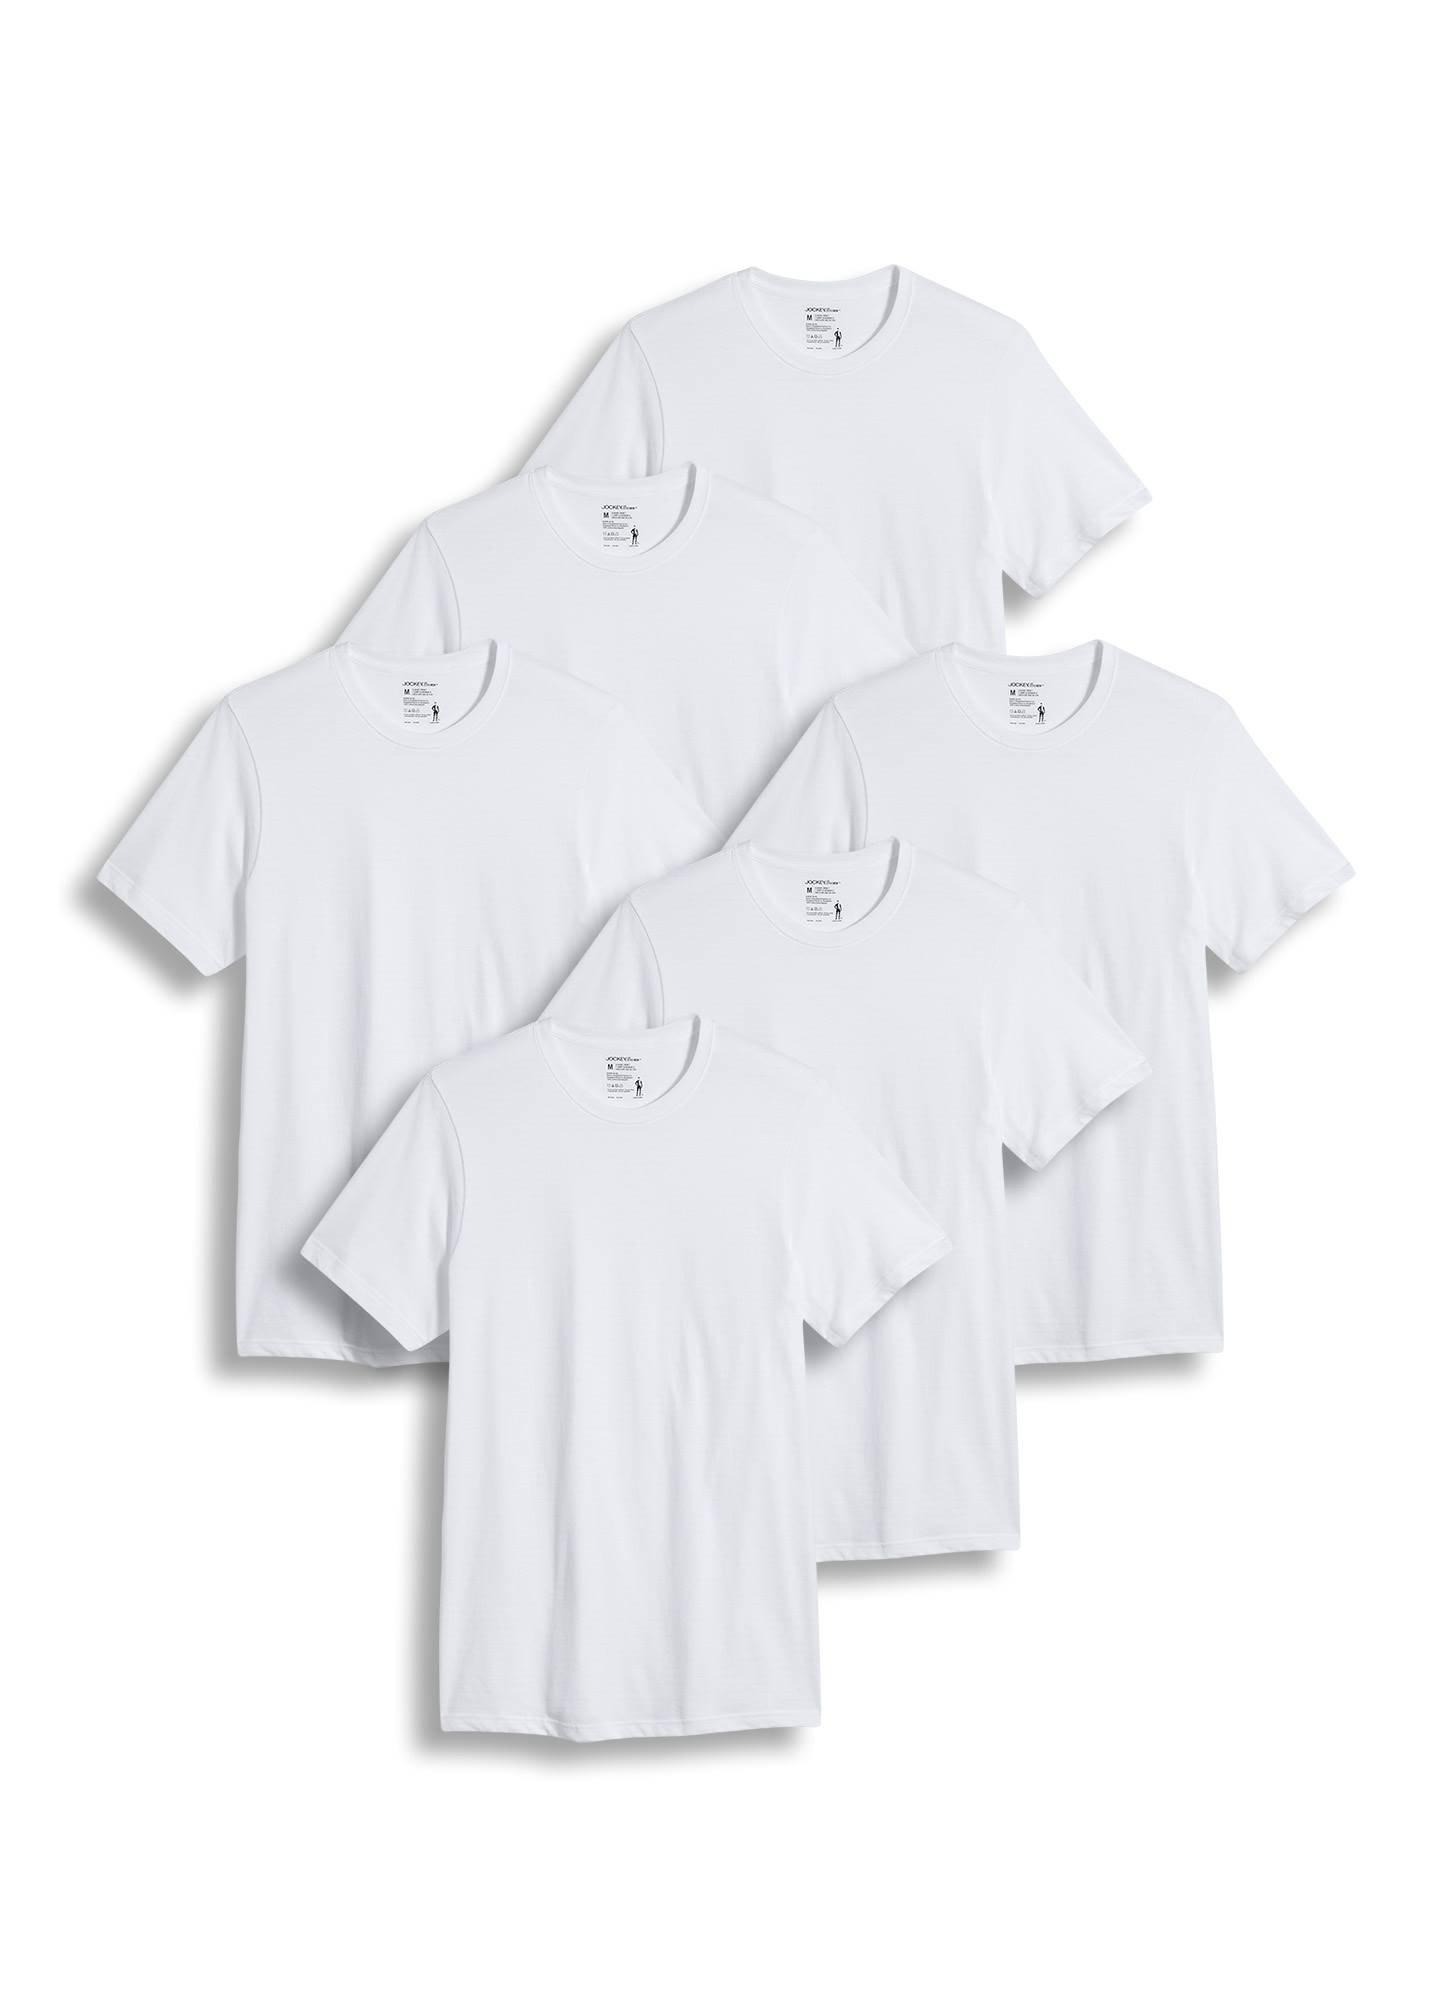 24 Pack Jockey Mens T-Shirts Big /& Tall Classic Crew Neck T-Shirt